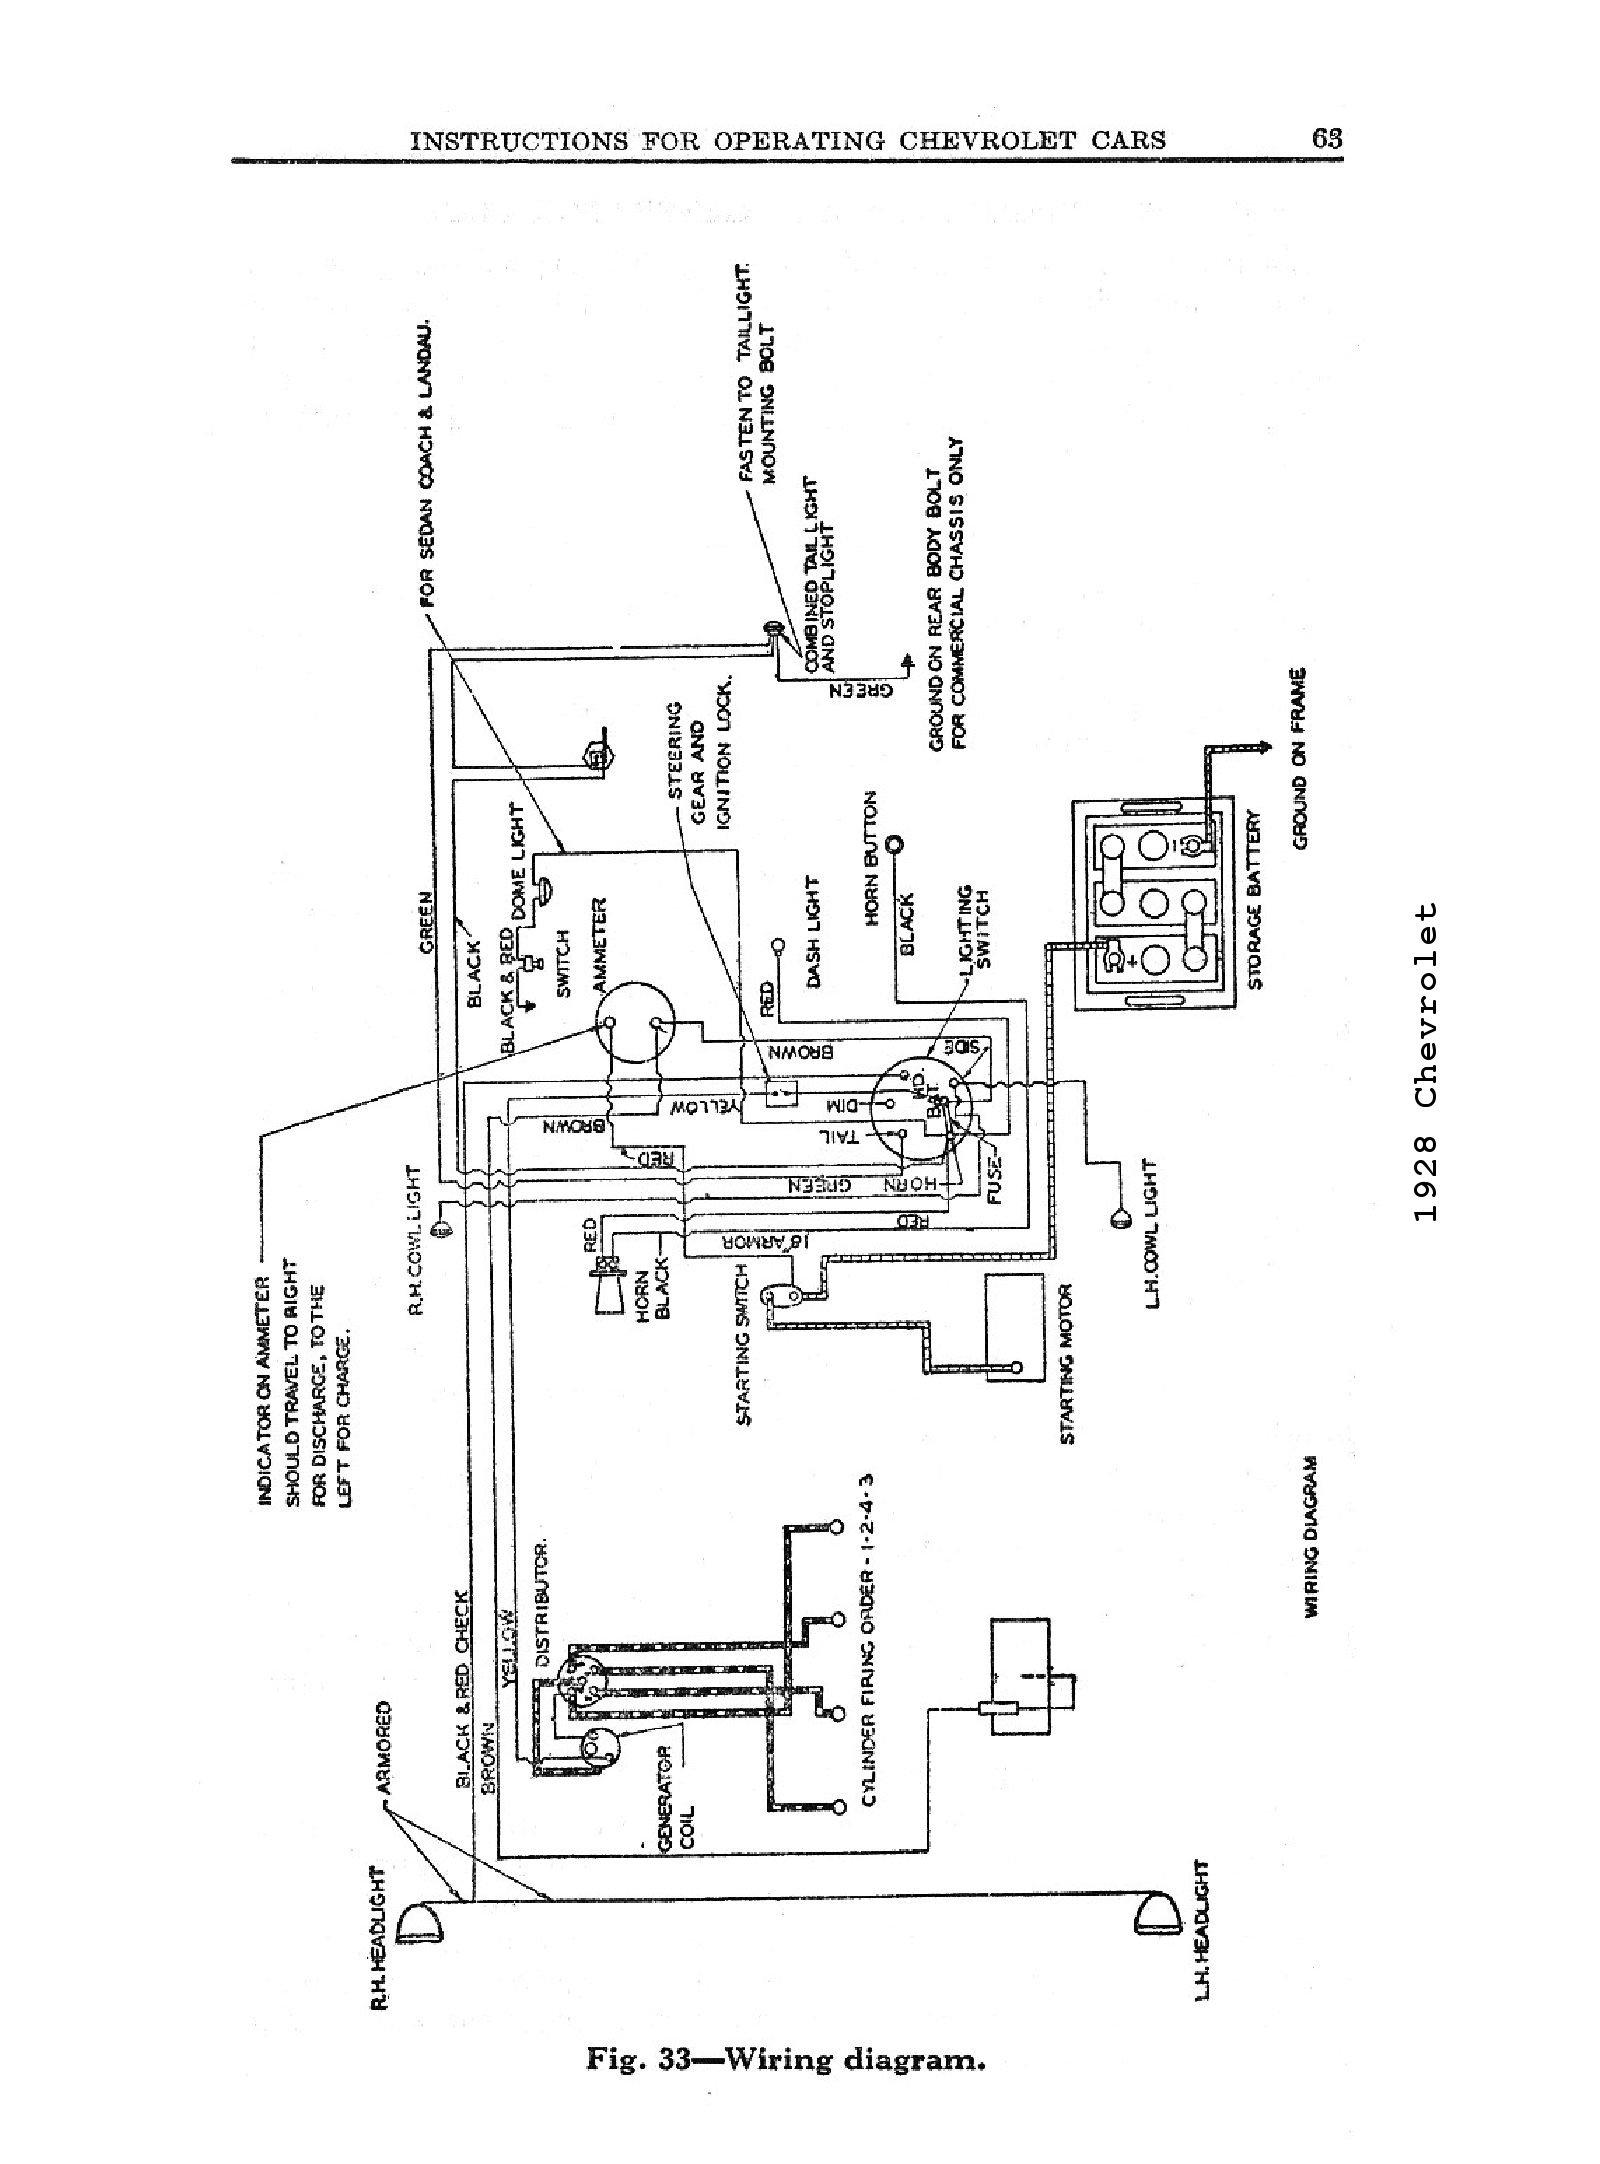 Fuel Gauge Wiring Diagram Chevy